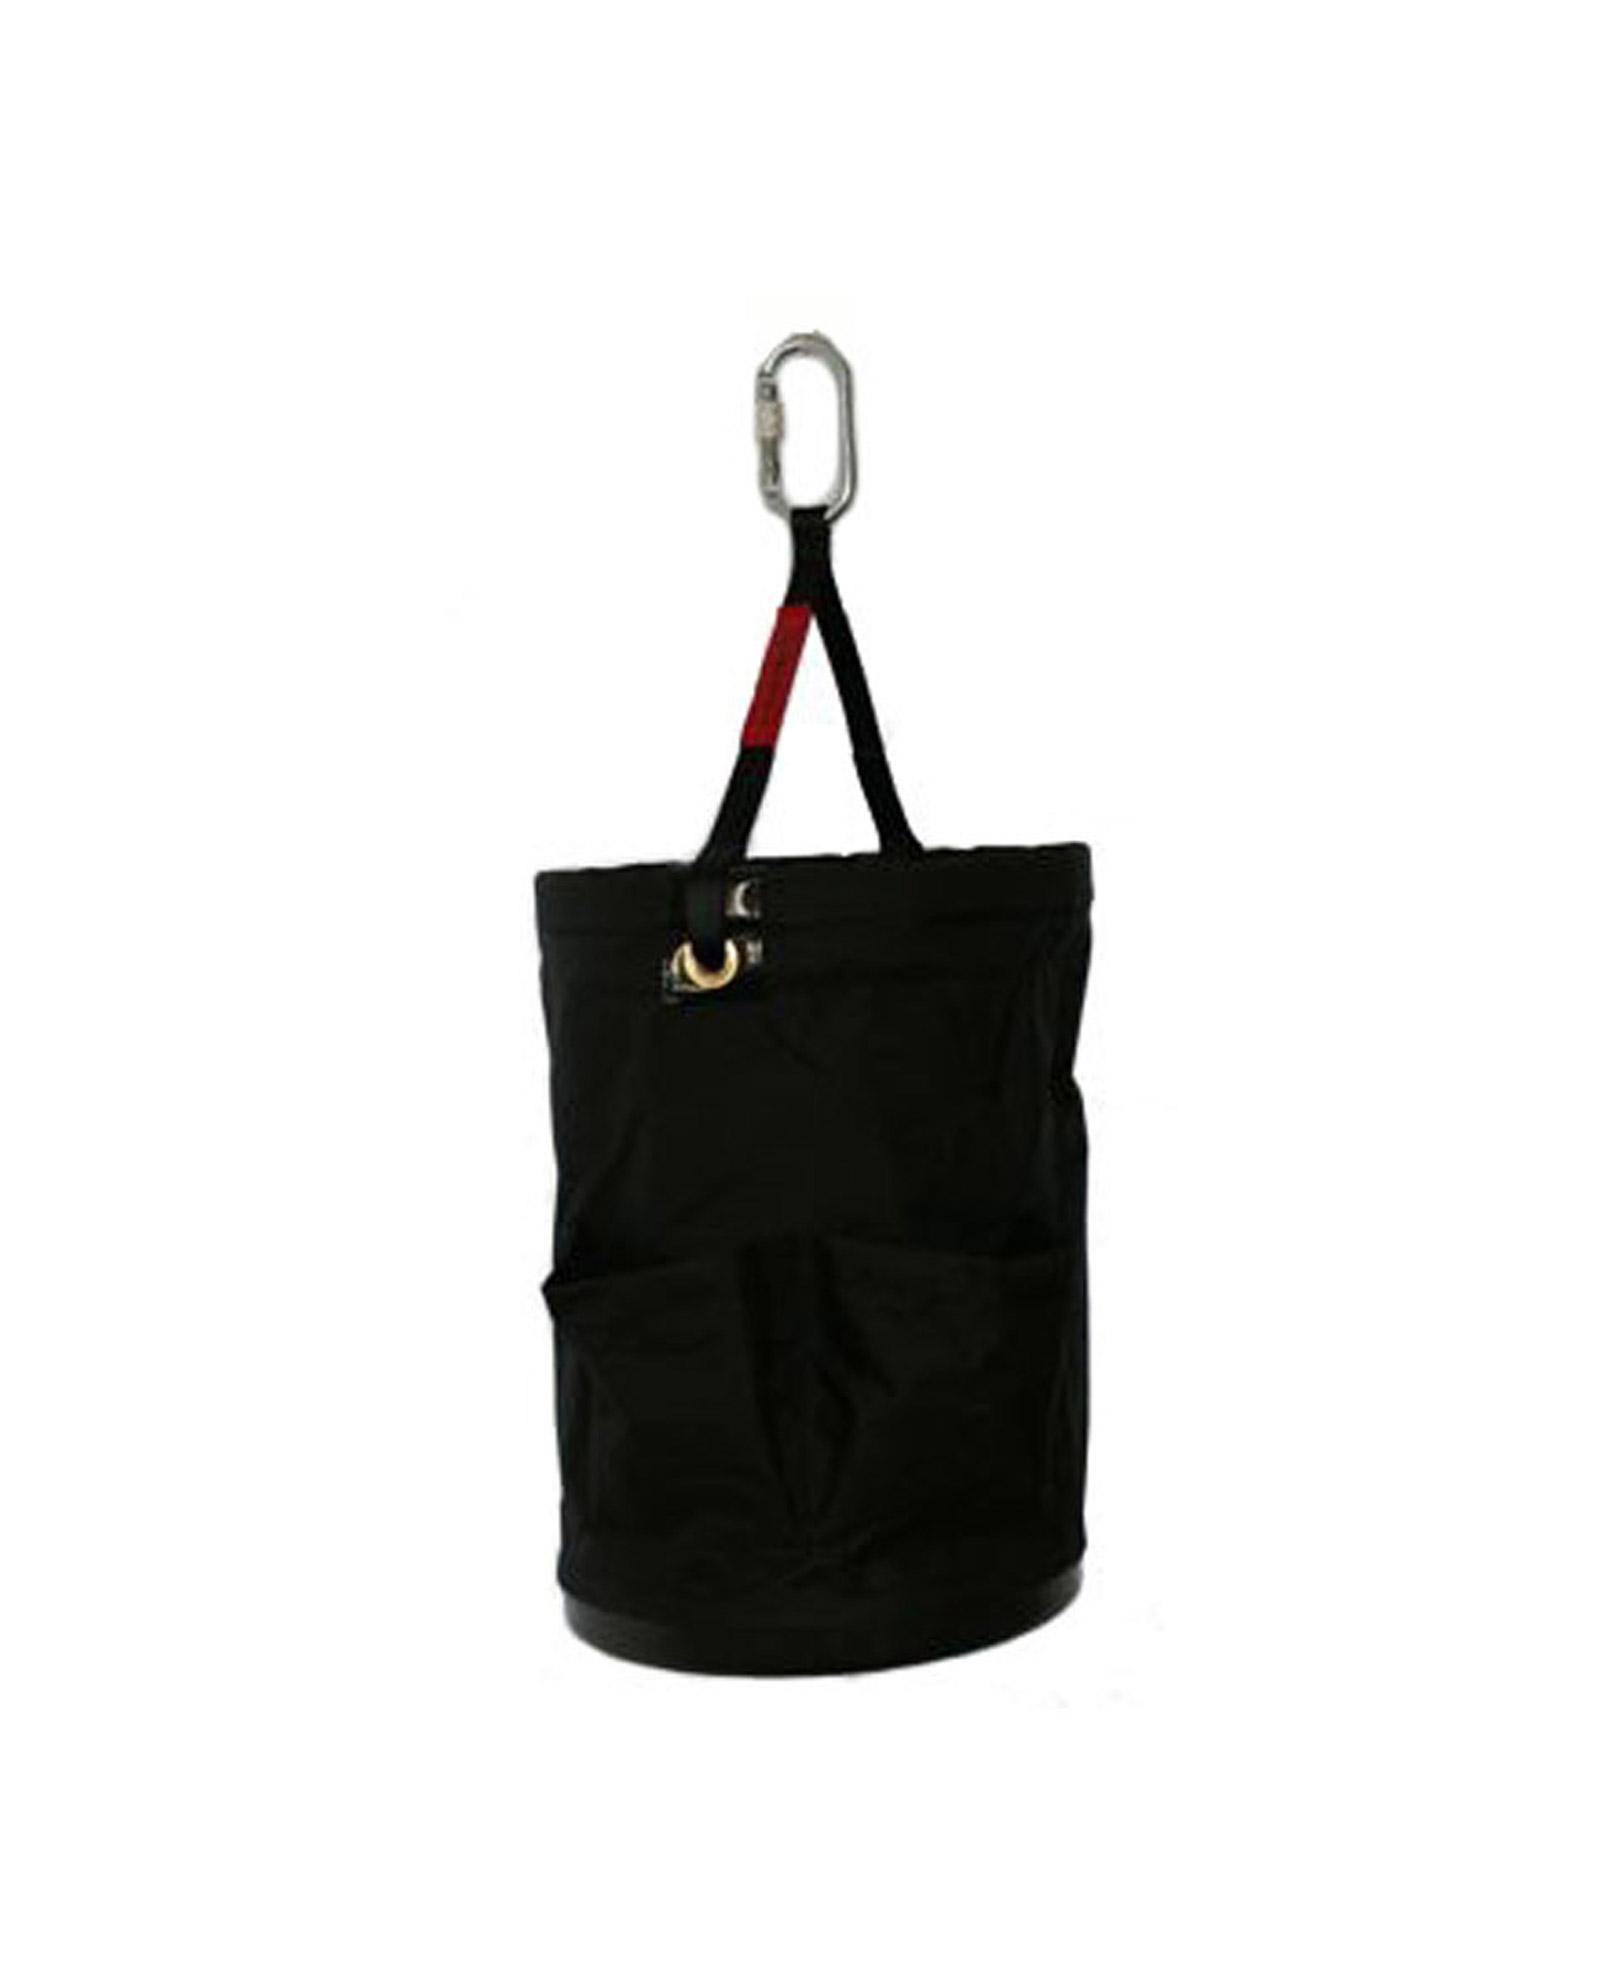 Standard Chain Bag Ideal For Manual Chain Blocks 1